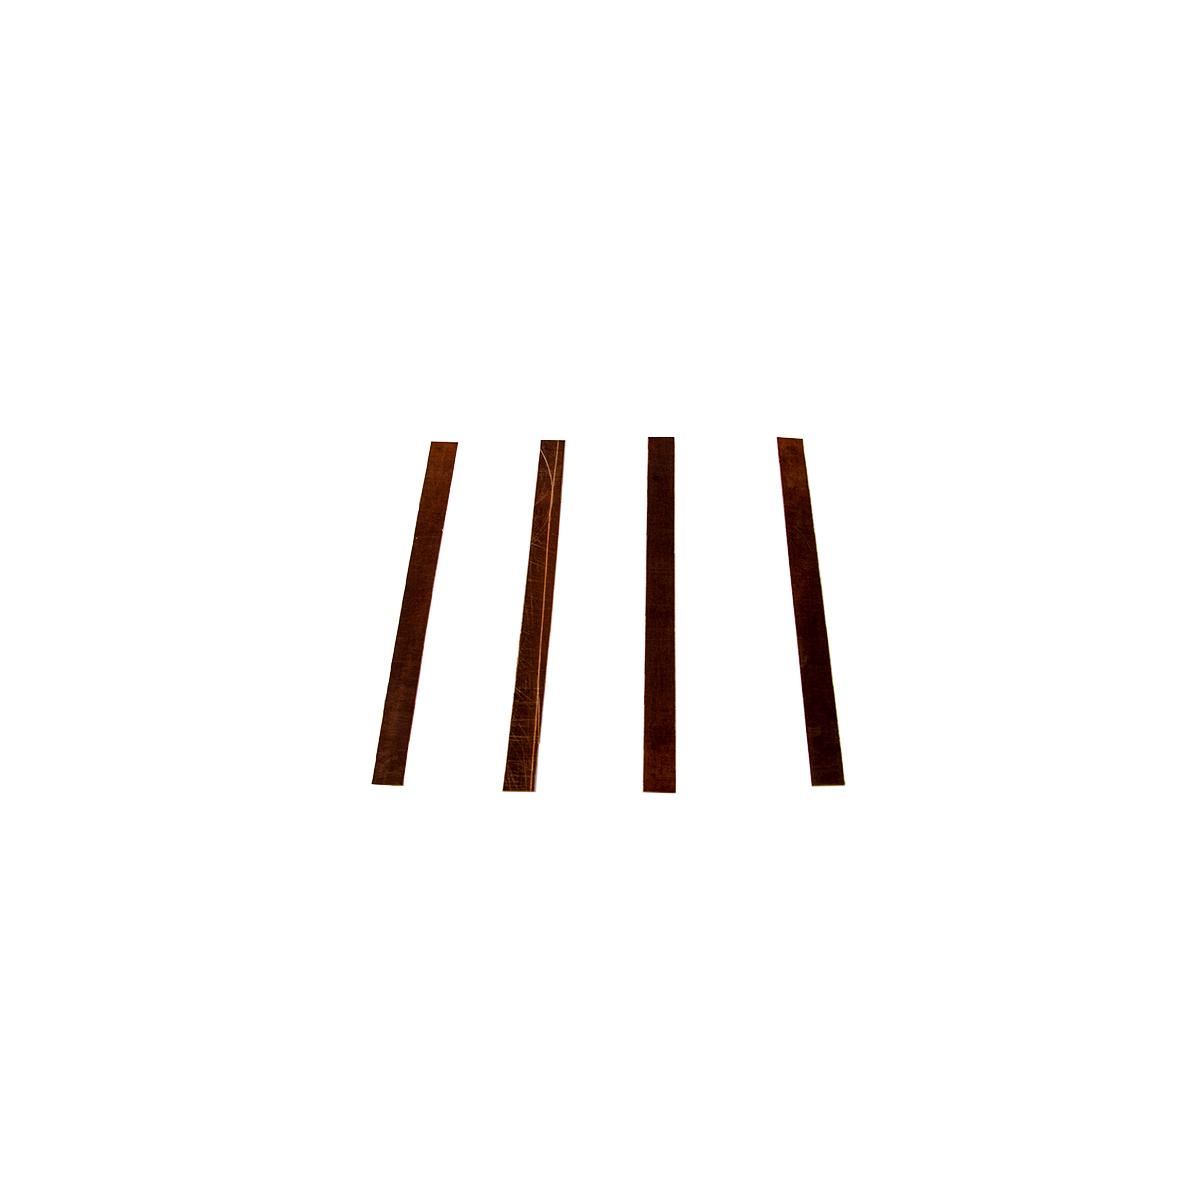 Micarta Para Caja De Orza (juego De 4)